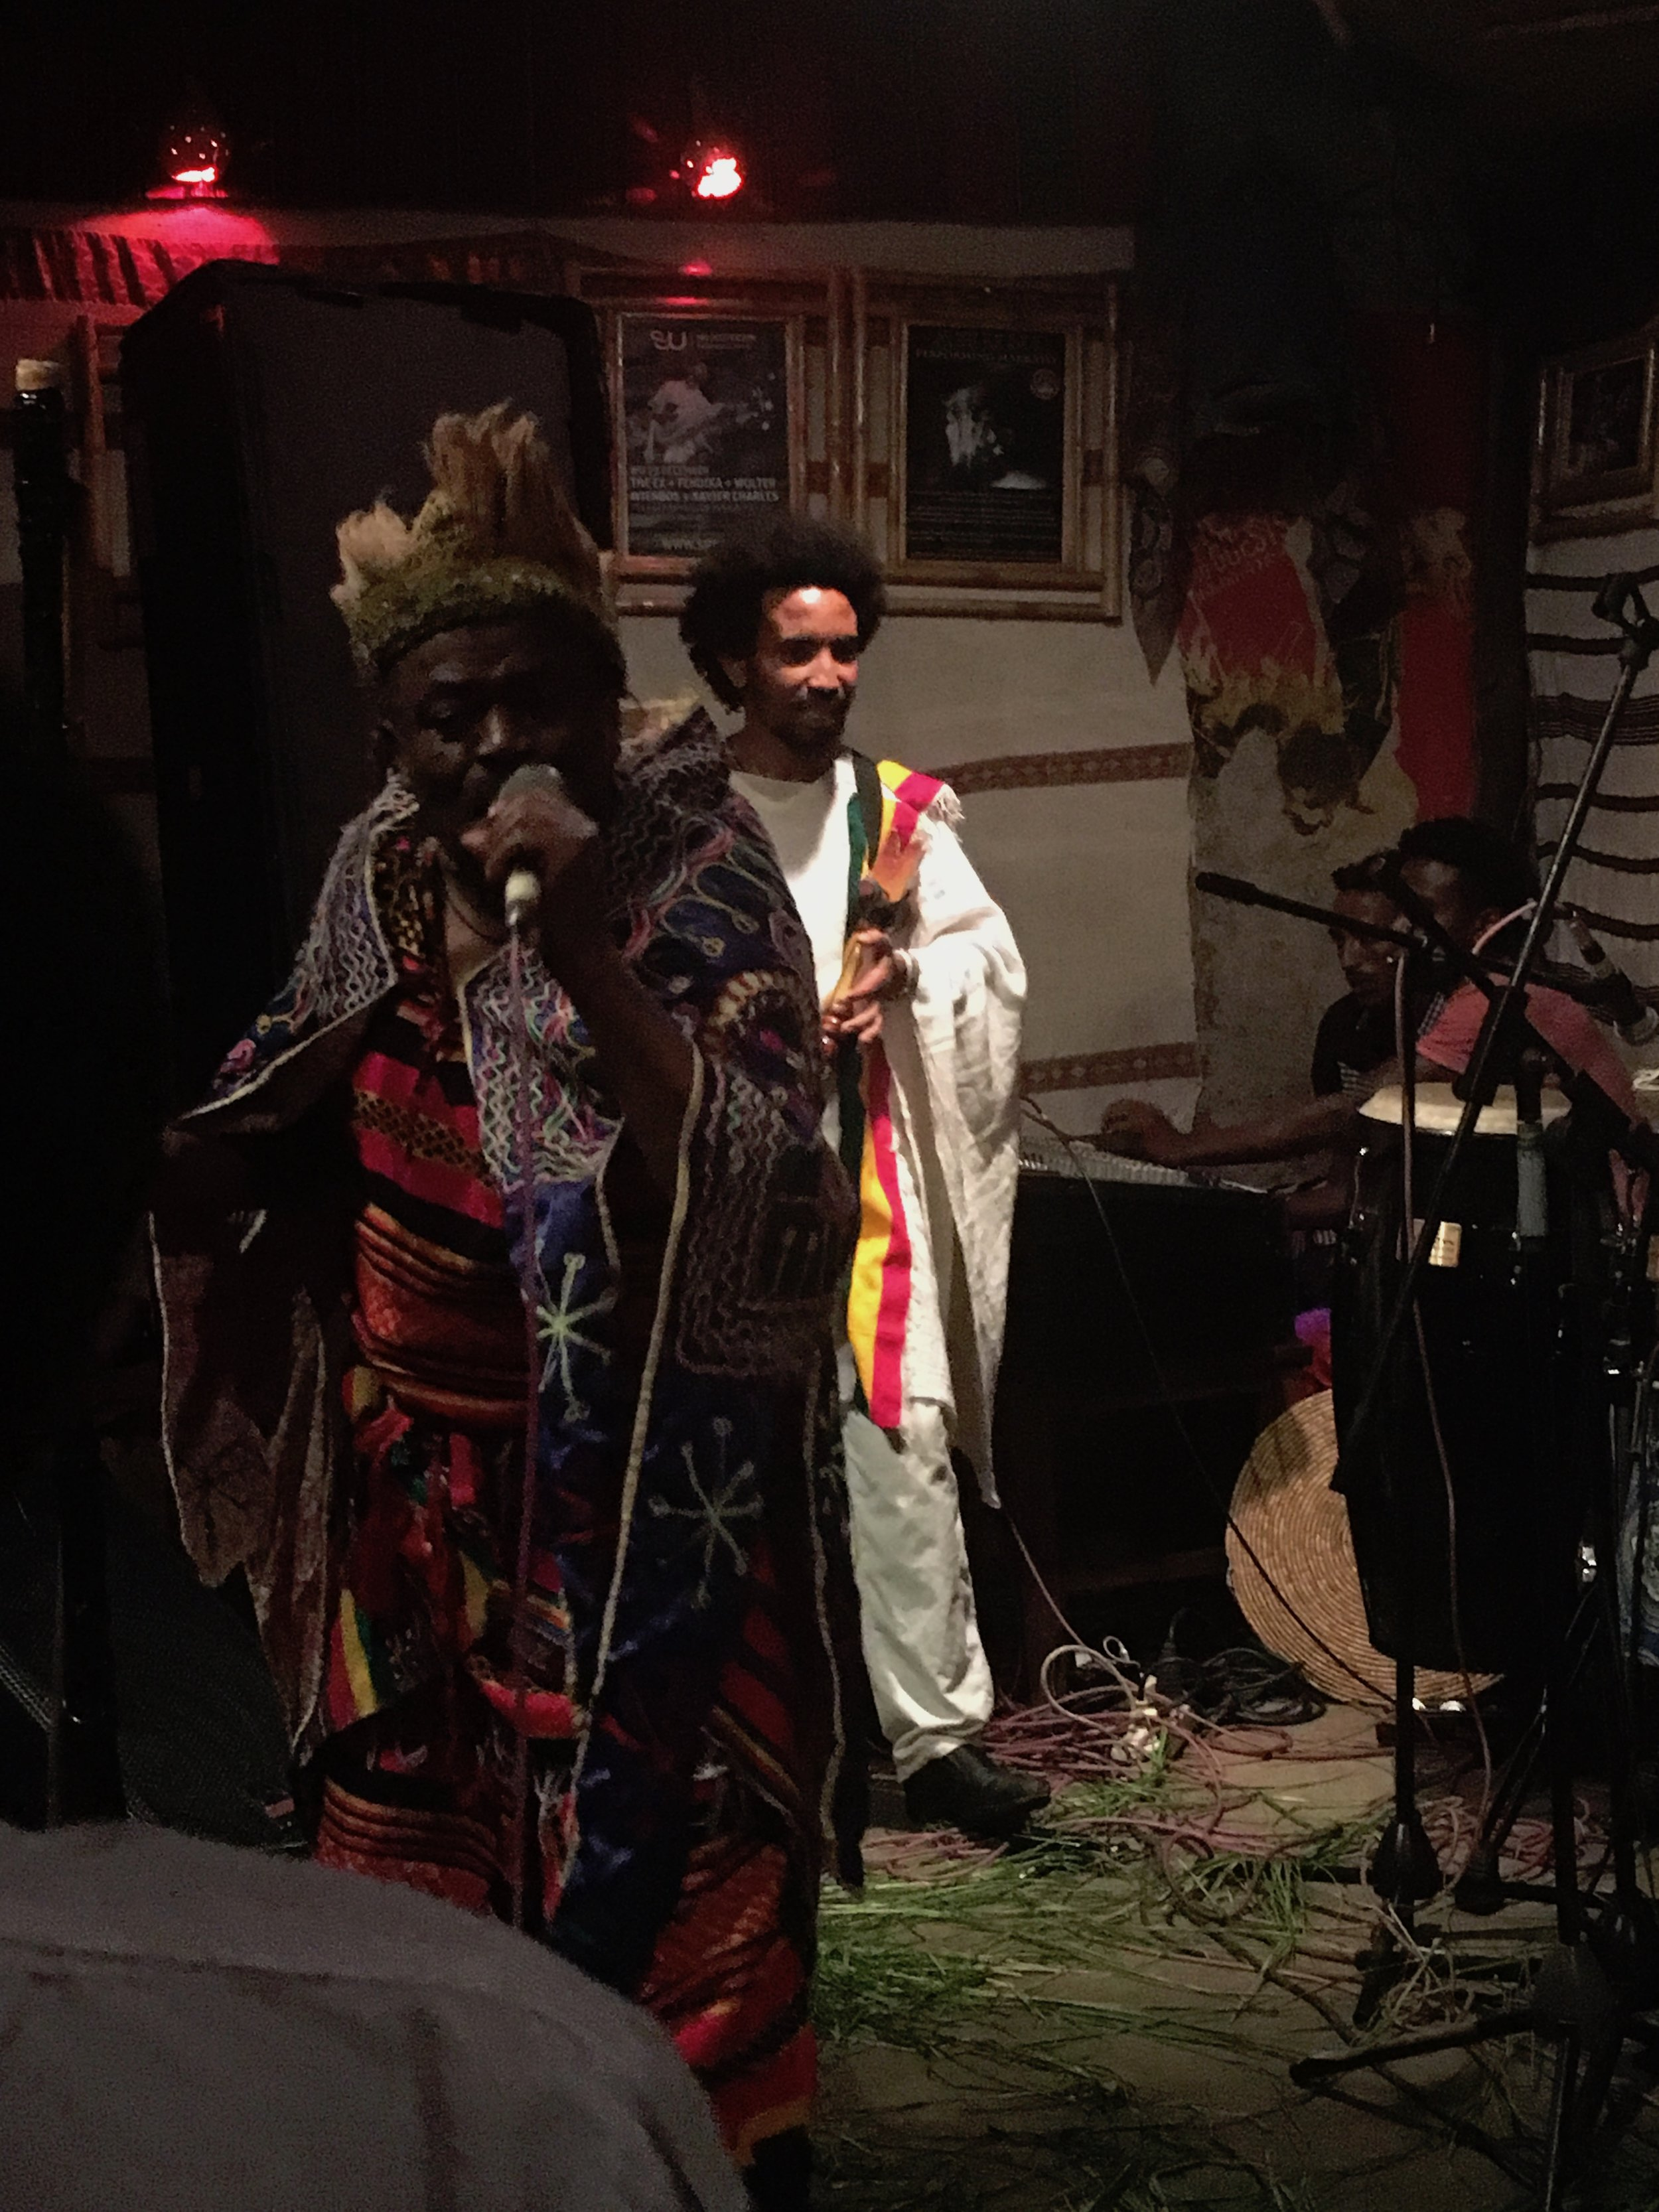 Fendika, a popular cultural bar, music club, and performance venue.